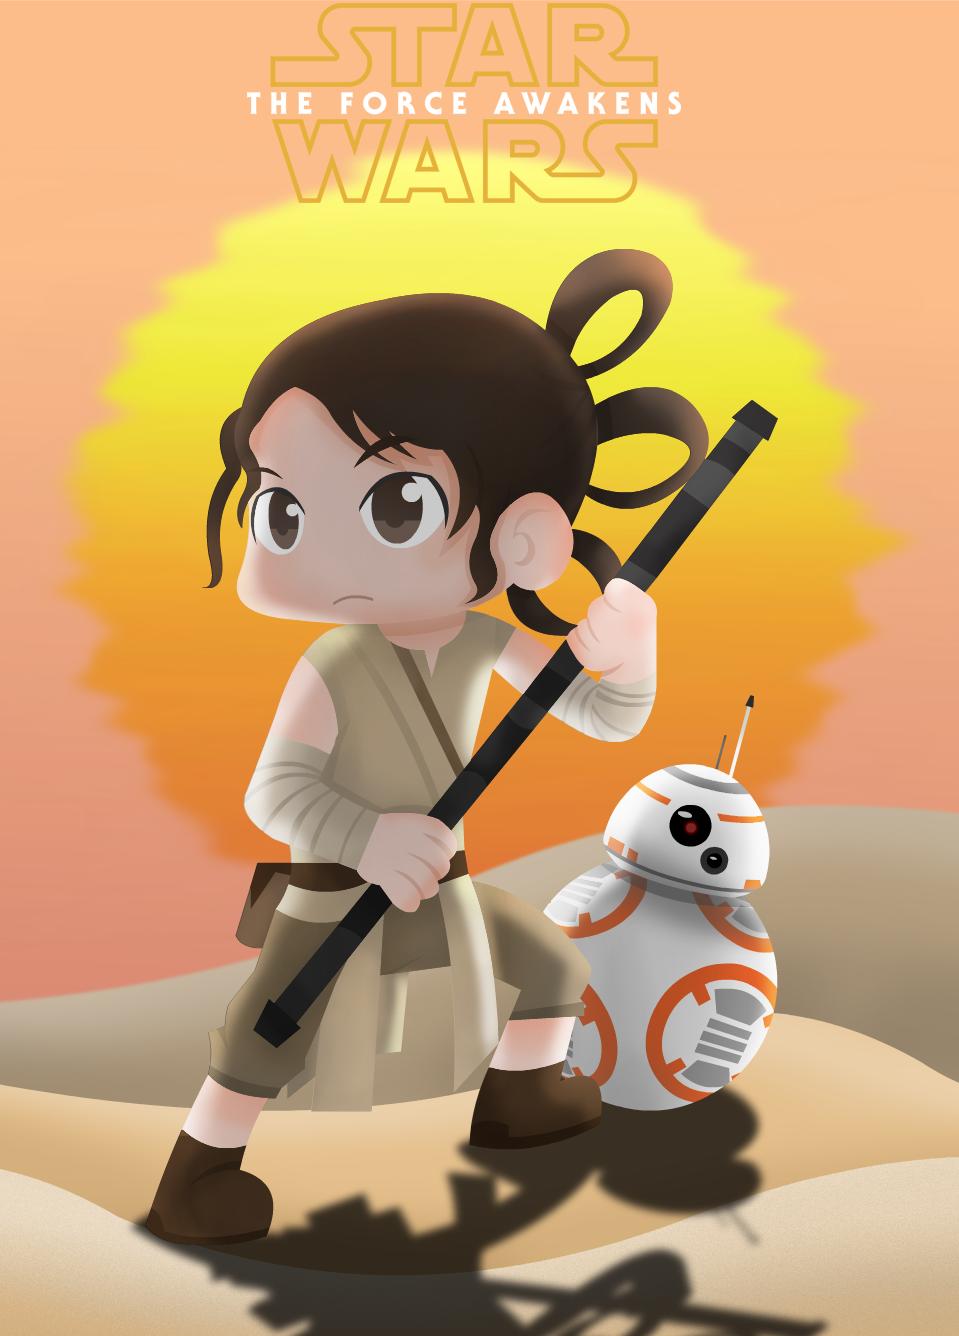 Rey Star Wars wallpaper ·① Download free cool wallpapers